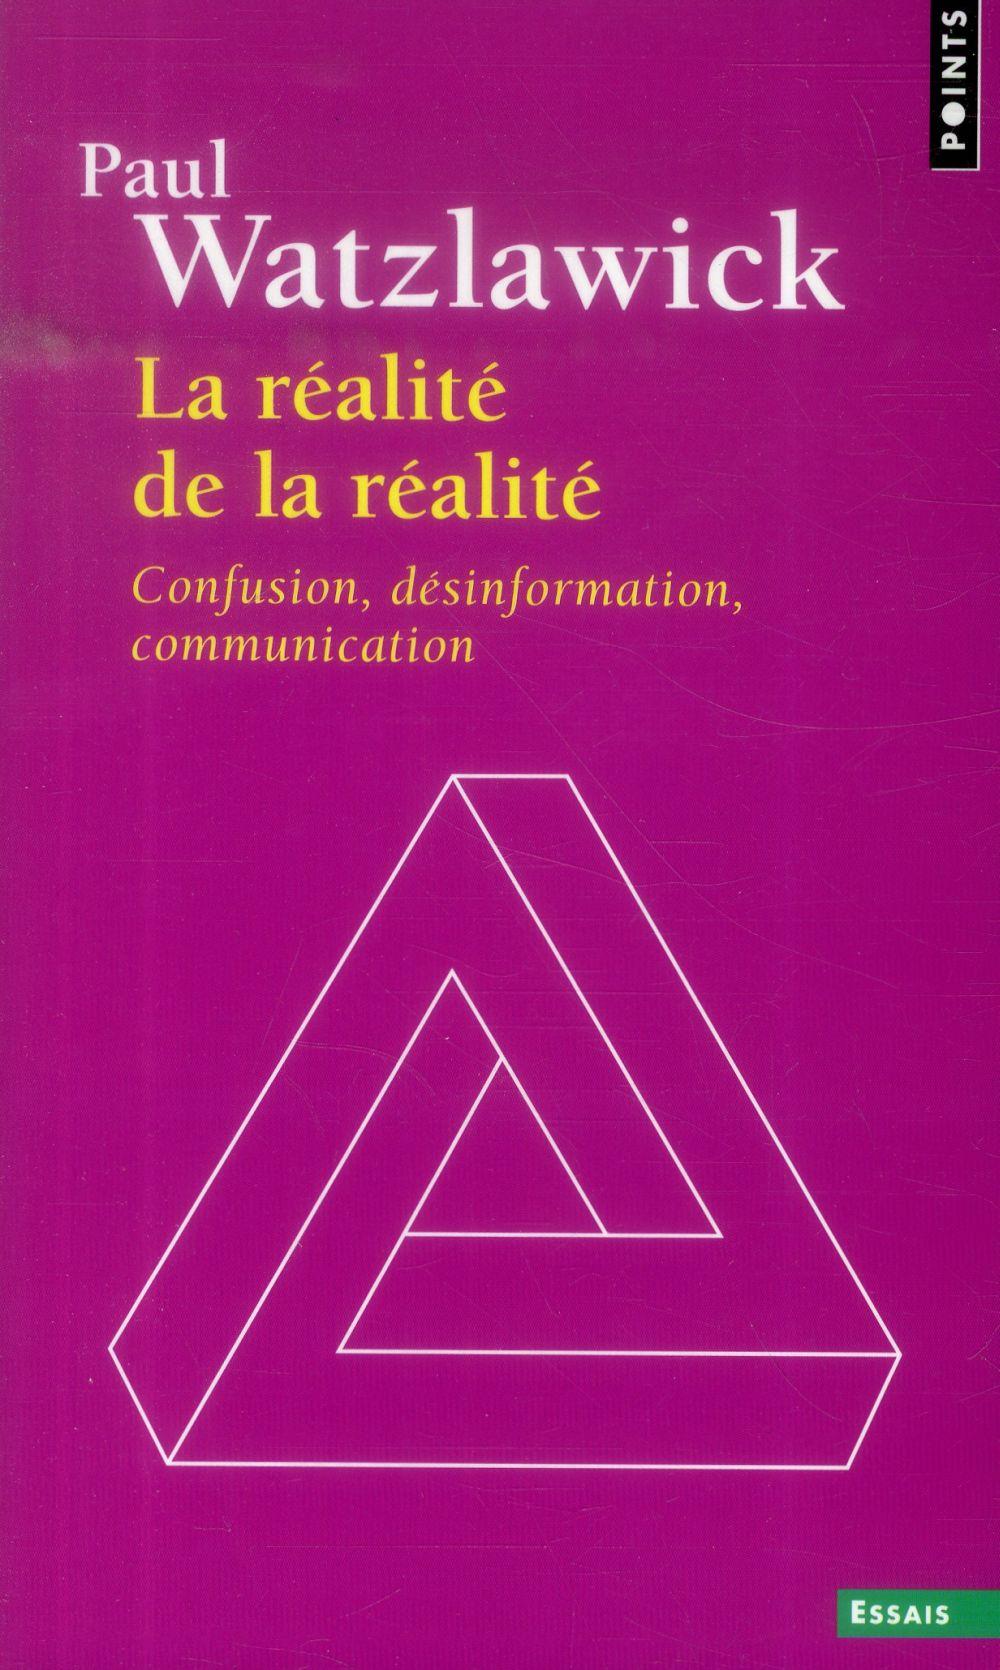 LA REALITE DE LA REALITE  -  CONFUSION, DESINFORMATION, COMMUNICATION